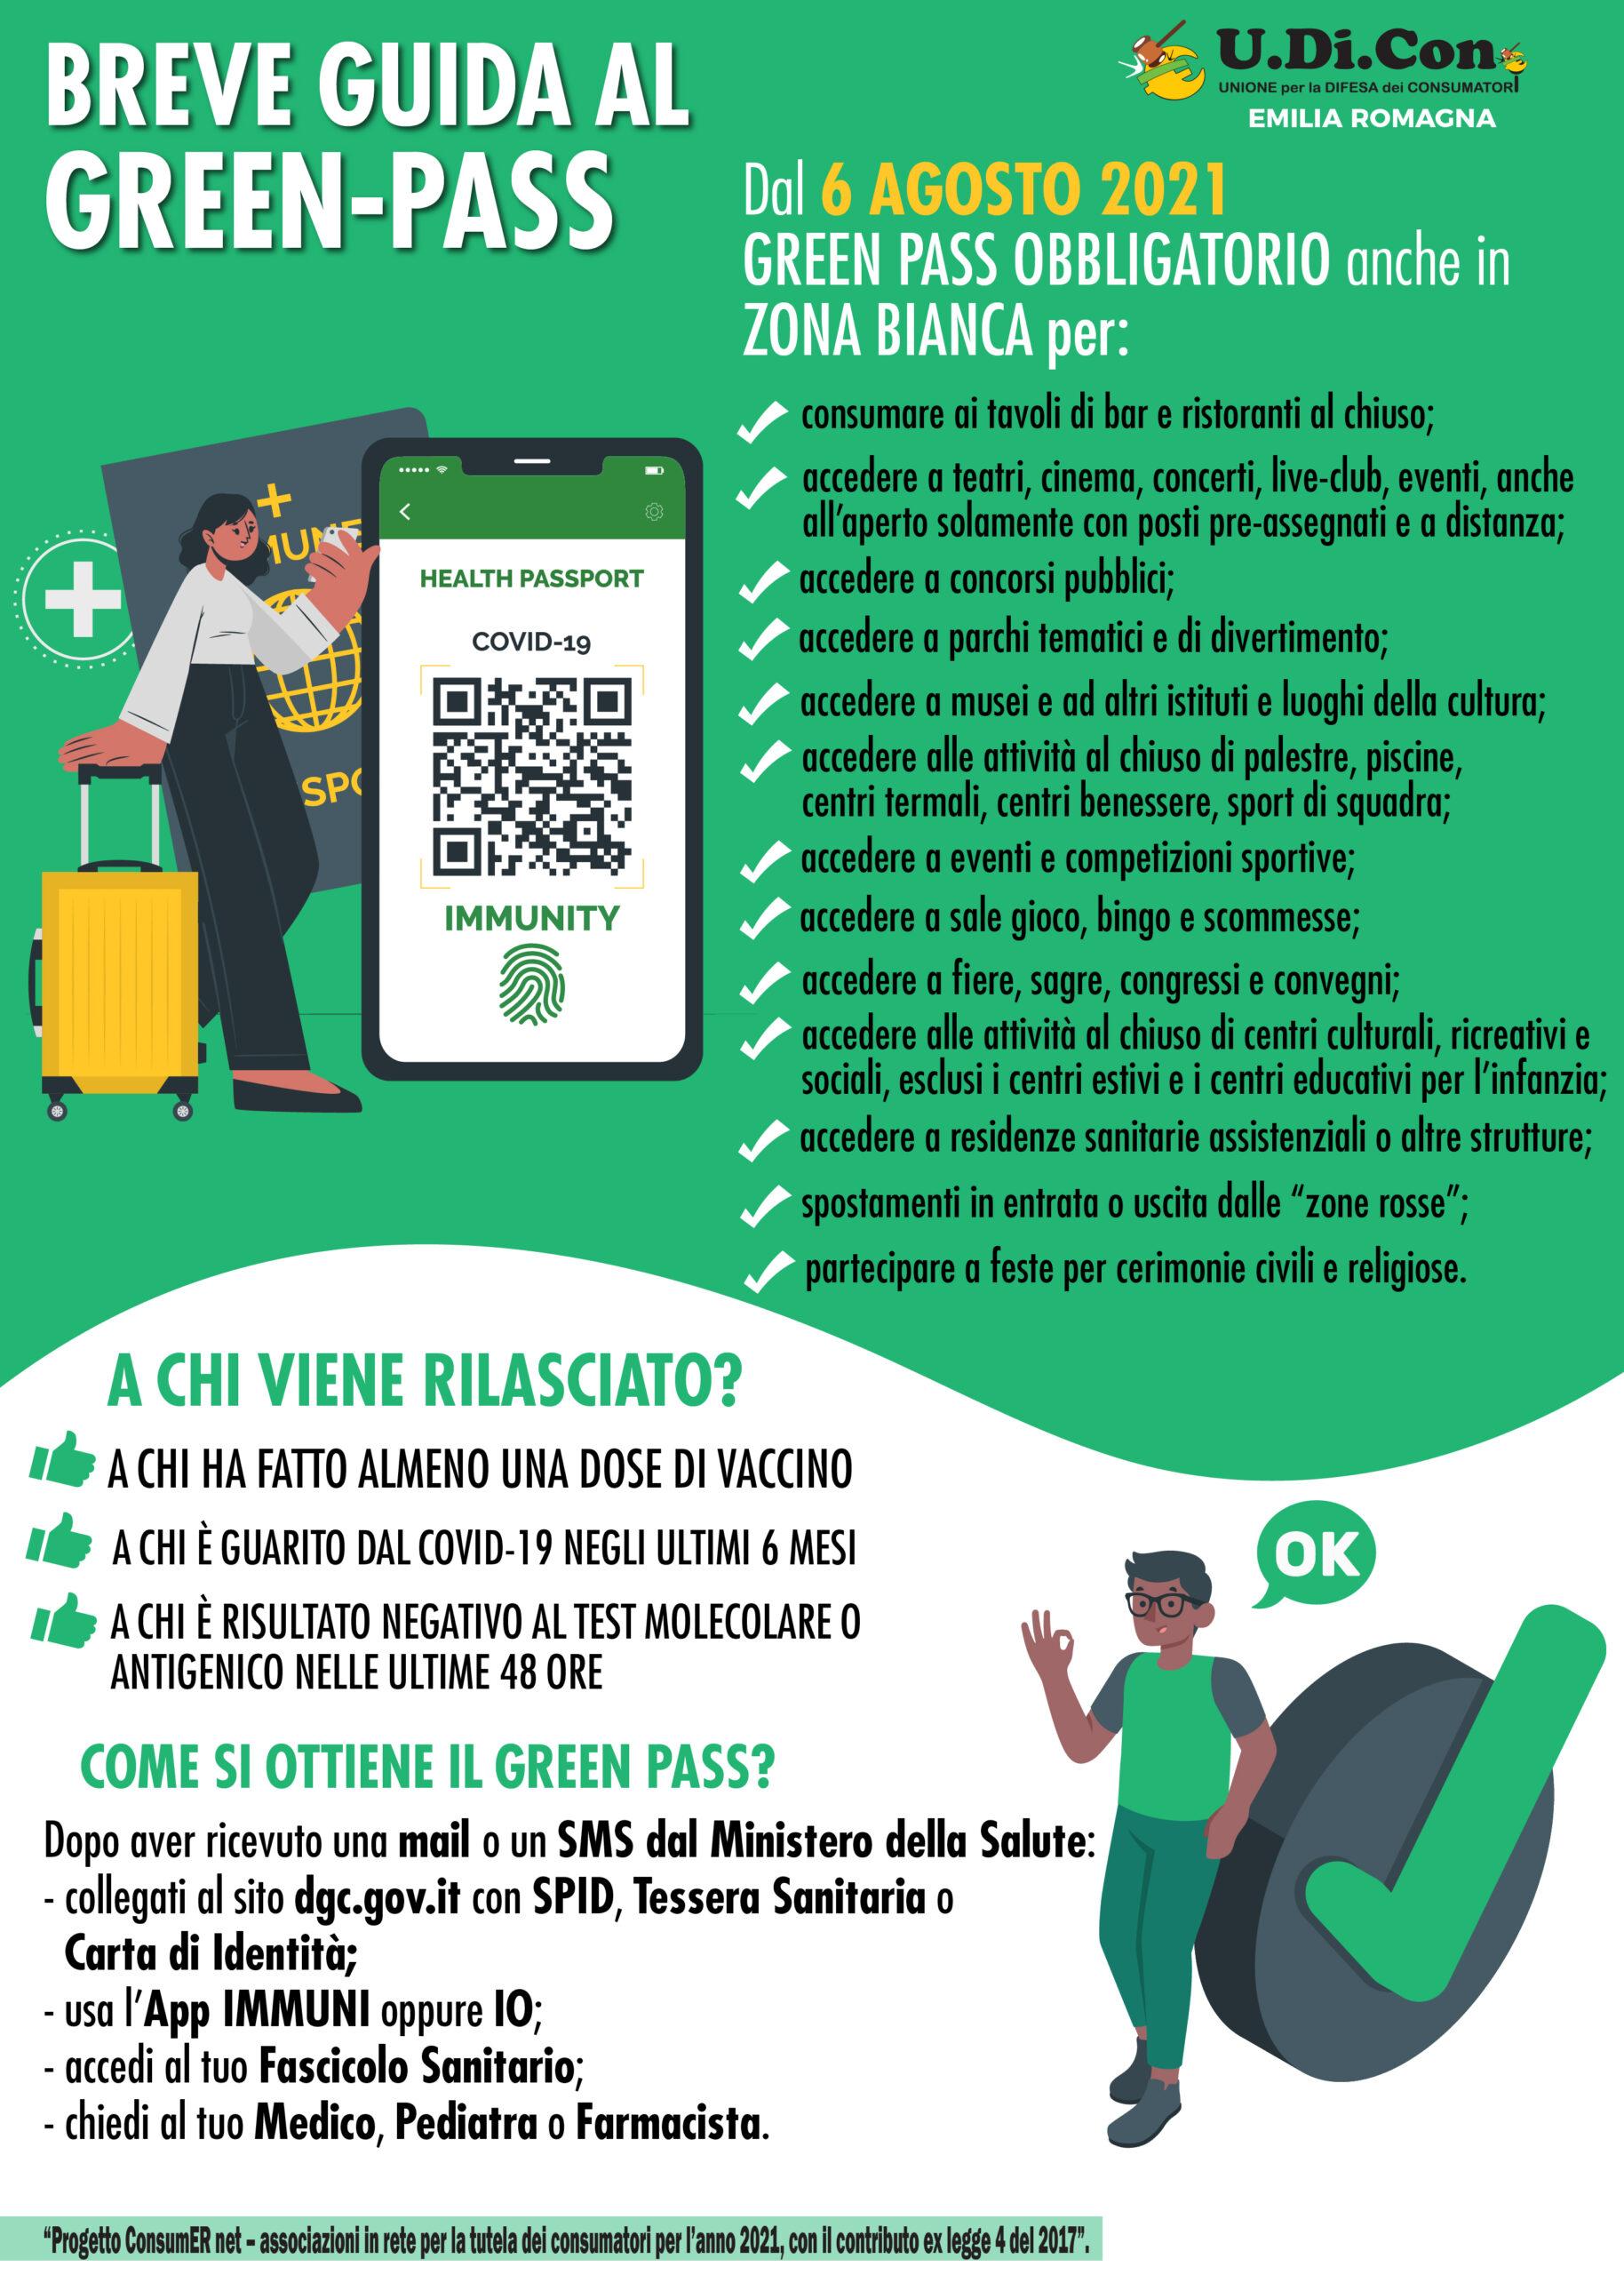 Infografica - Breve guida al Green Pass